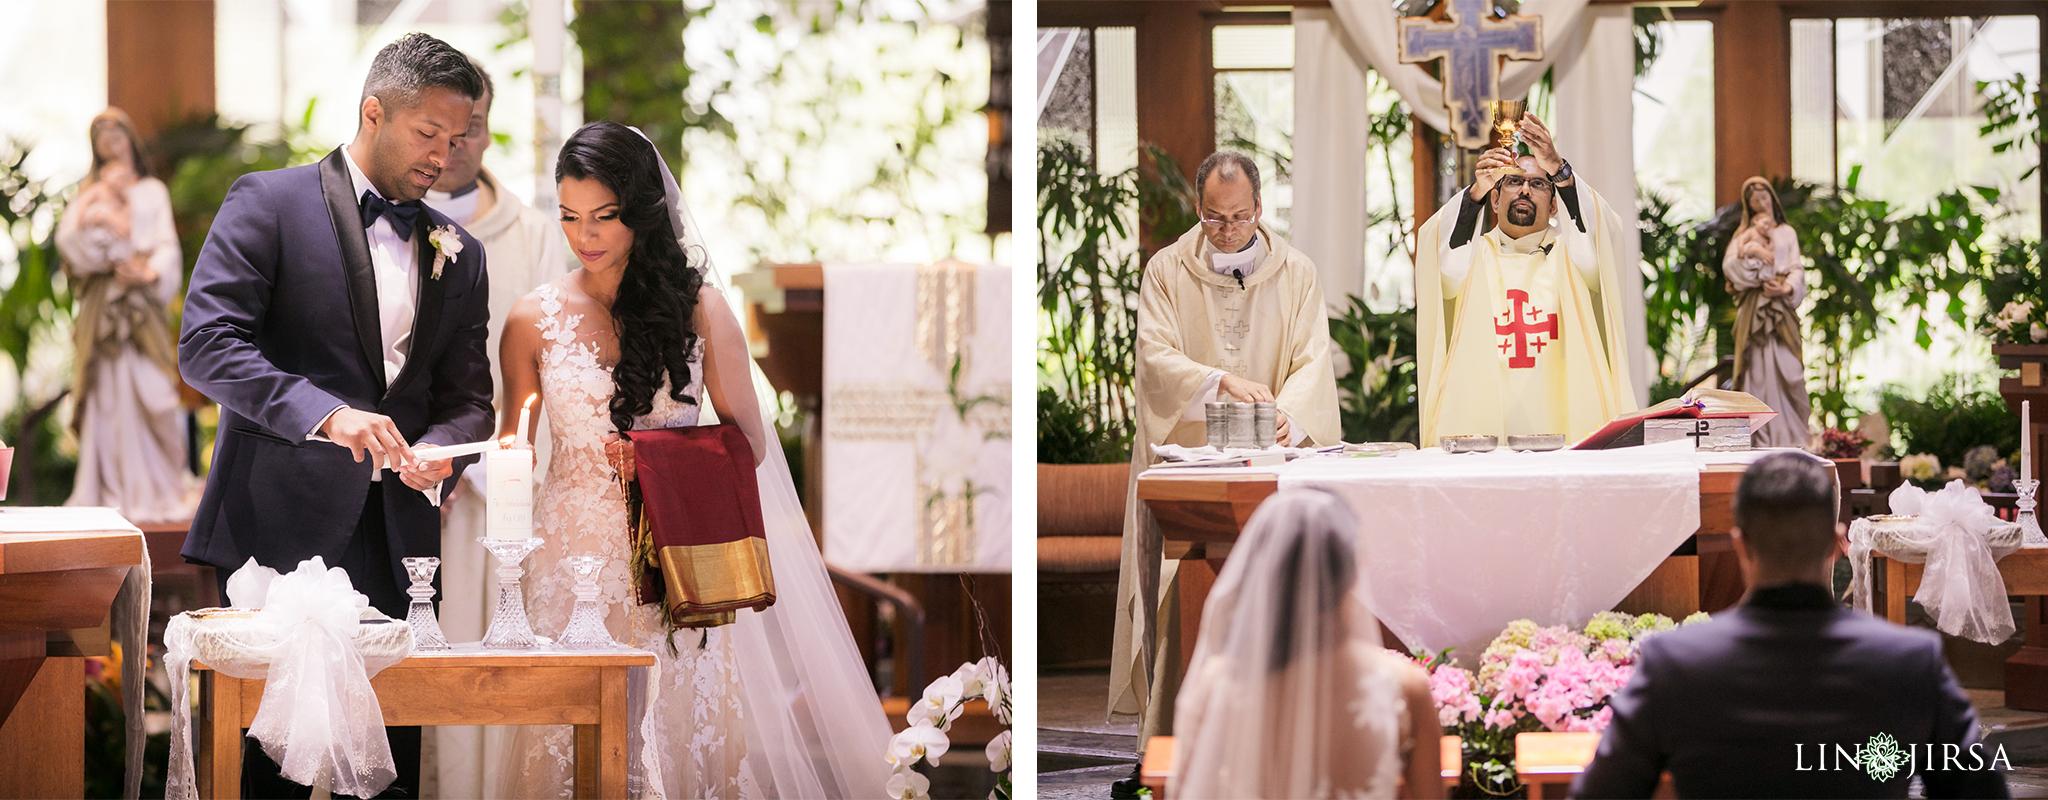 17 St Gregory Church San Diego Indian Wedding Photography